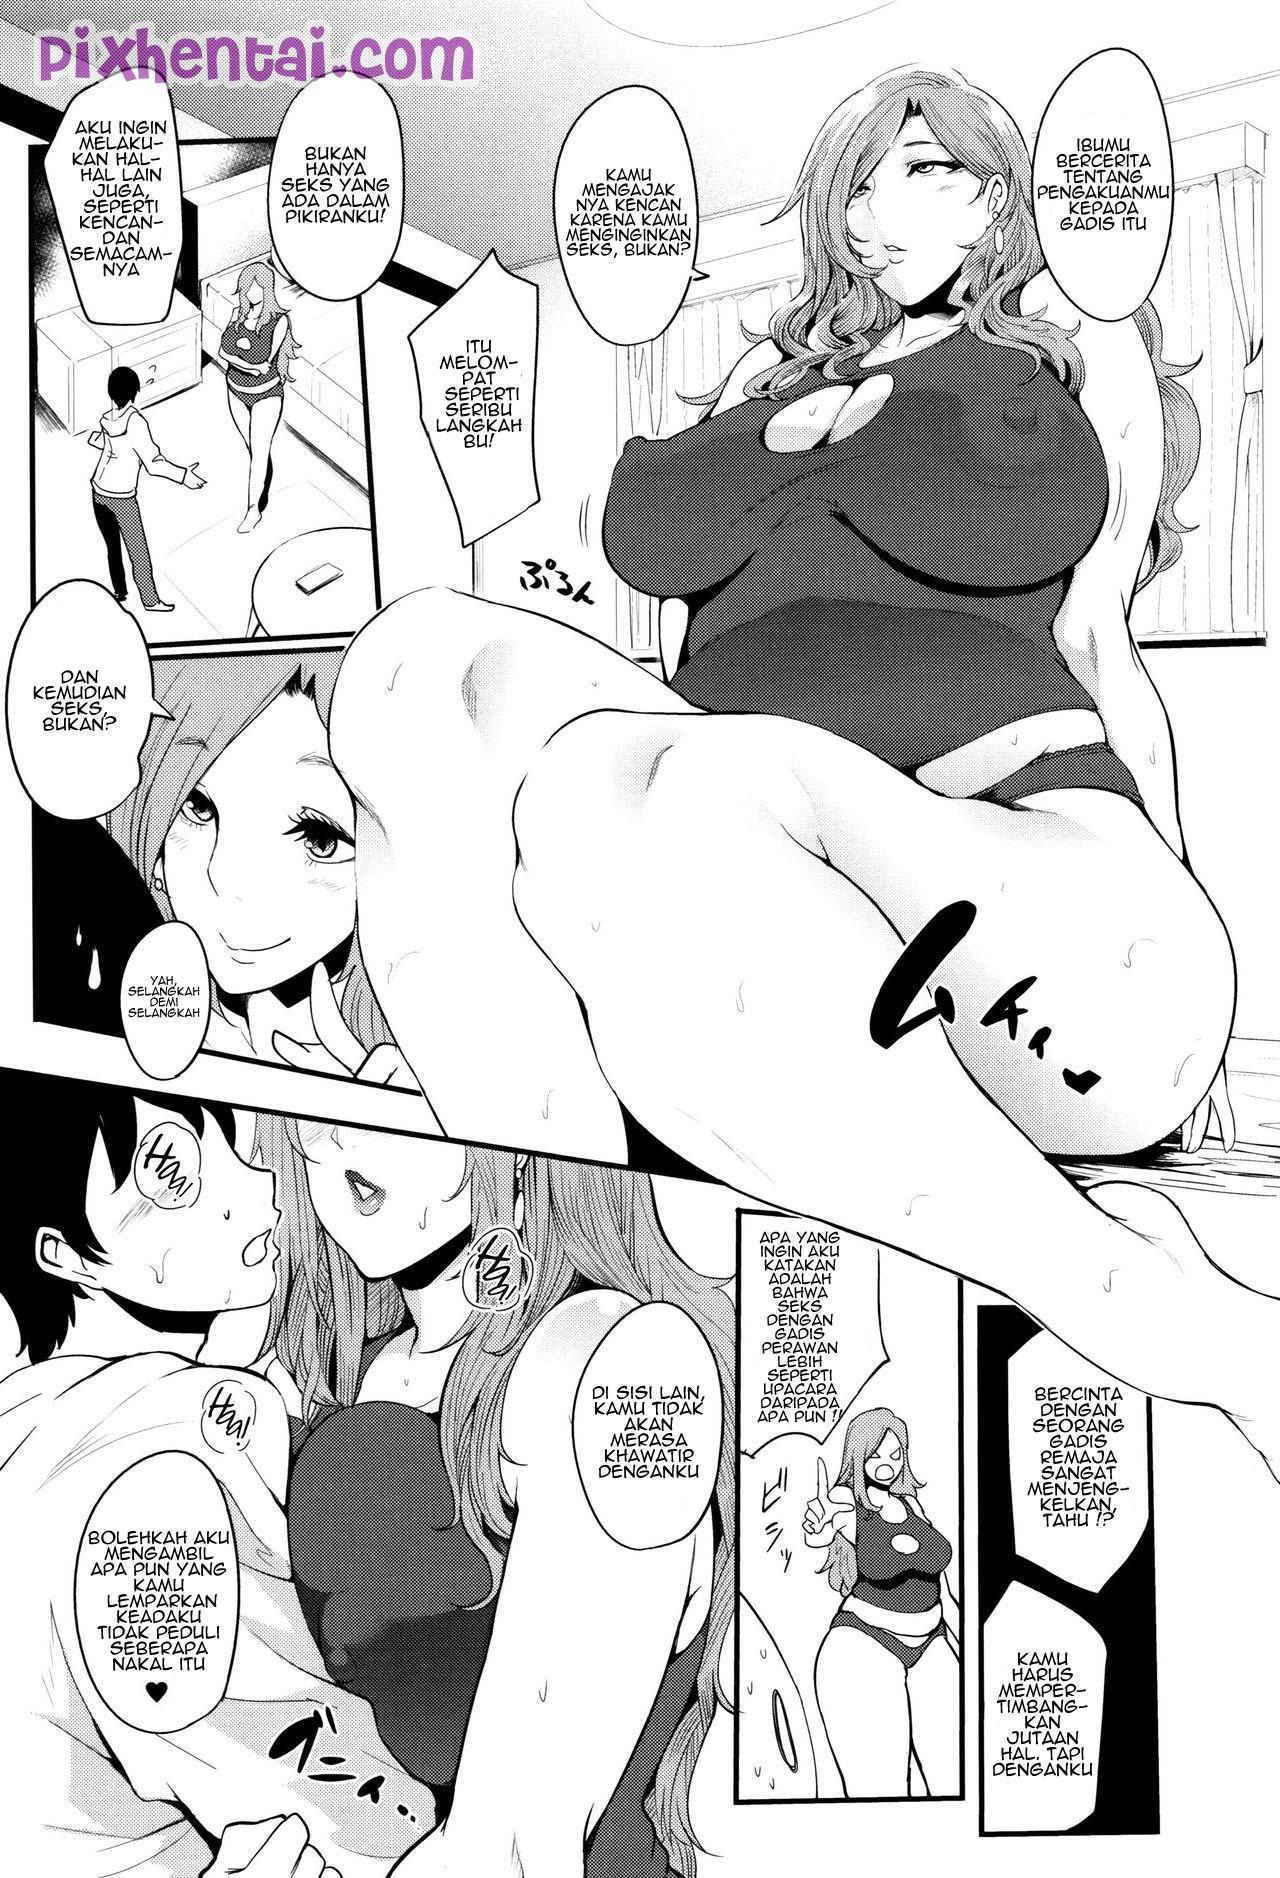 Komik hentai xxx manga sex bokep daya tarik seks teman-teman ibu 11